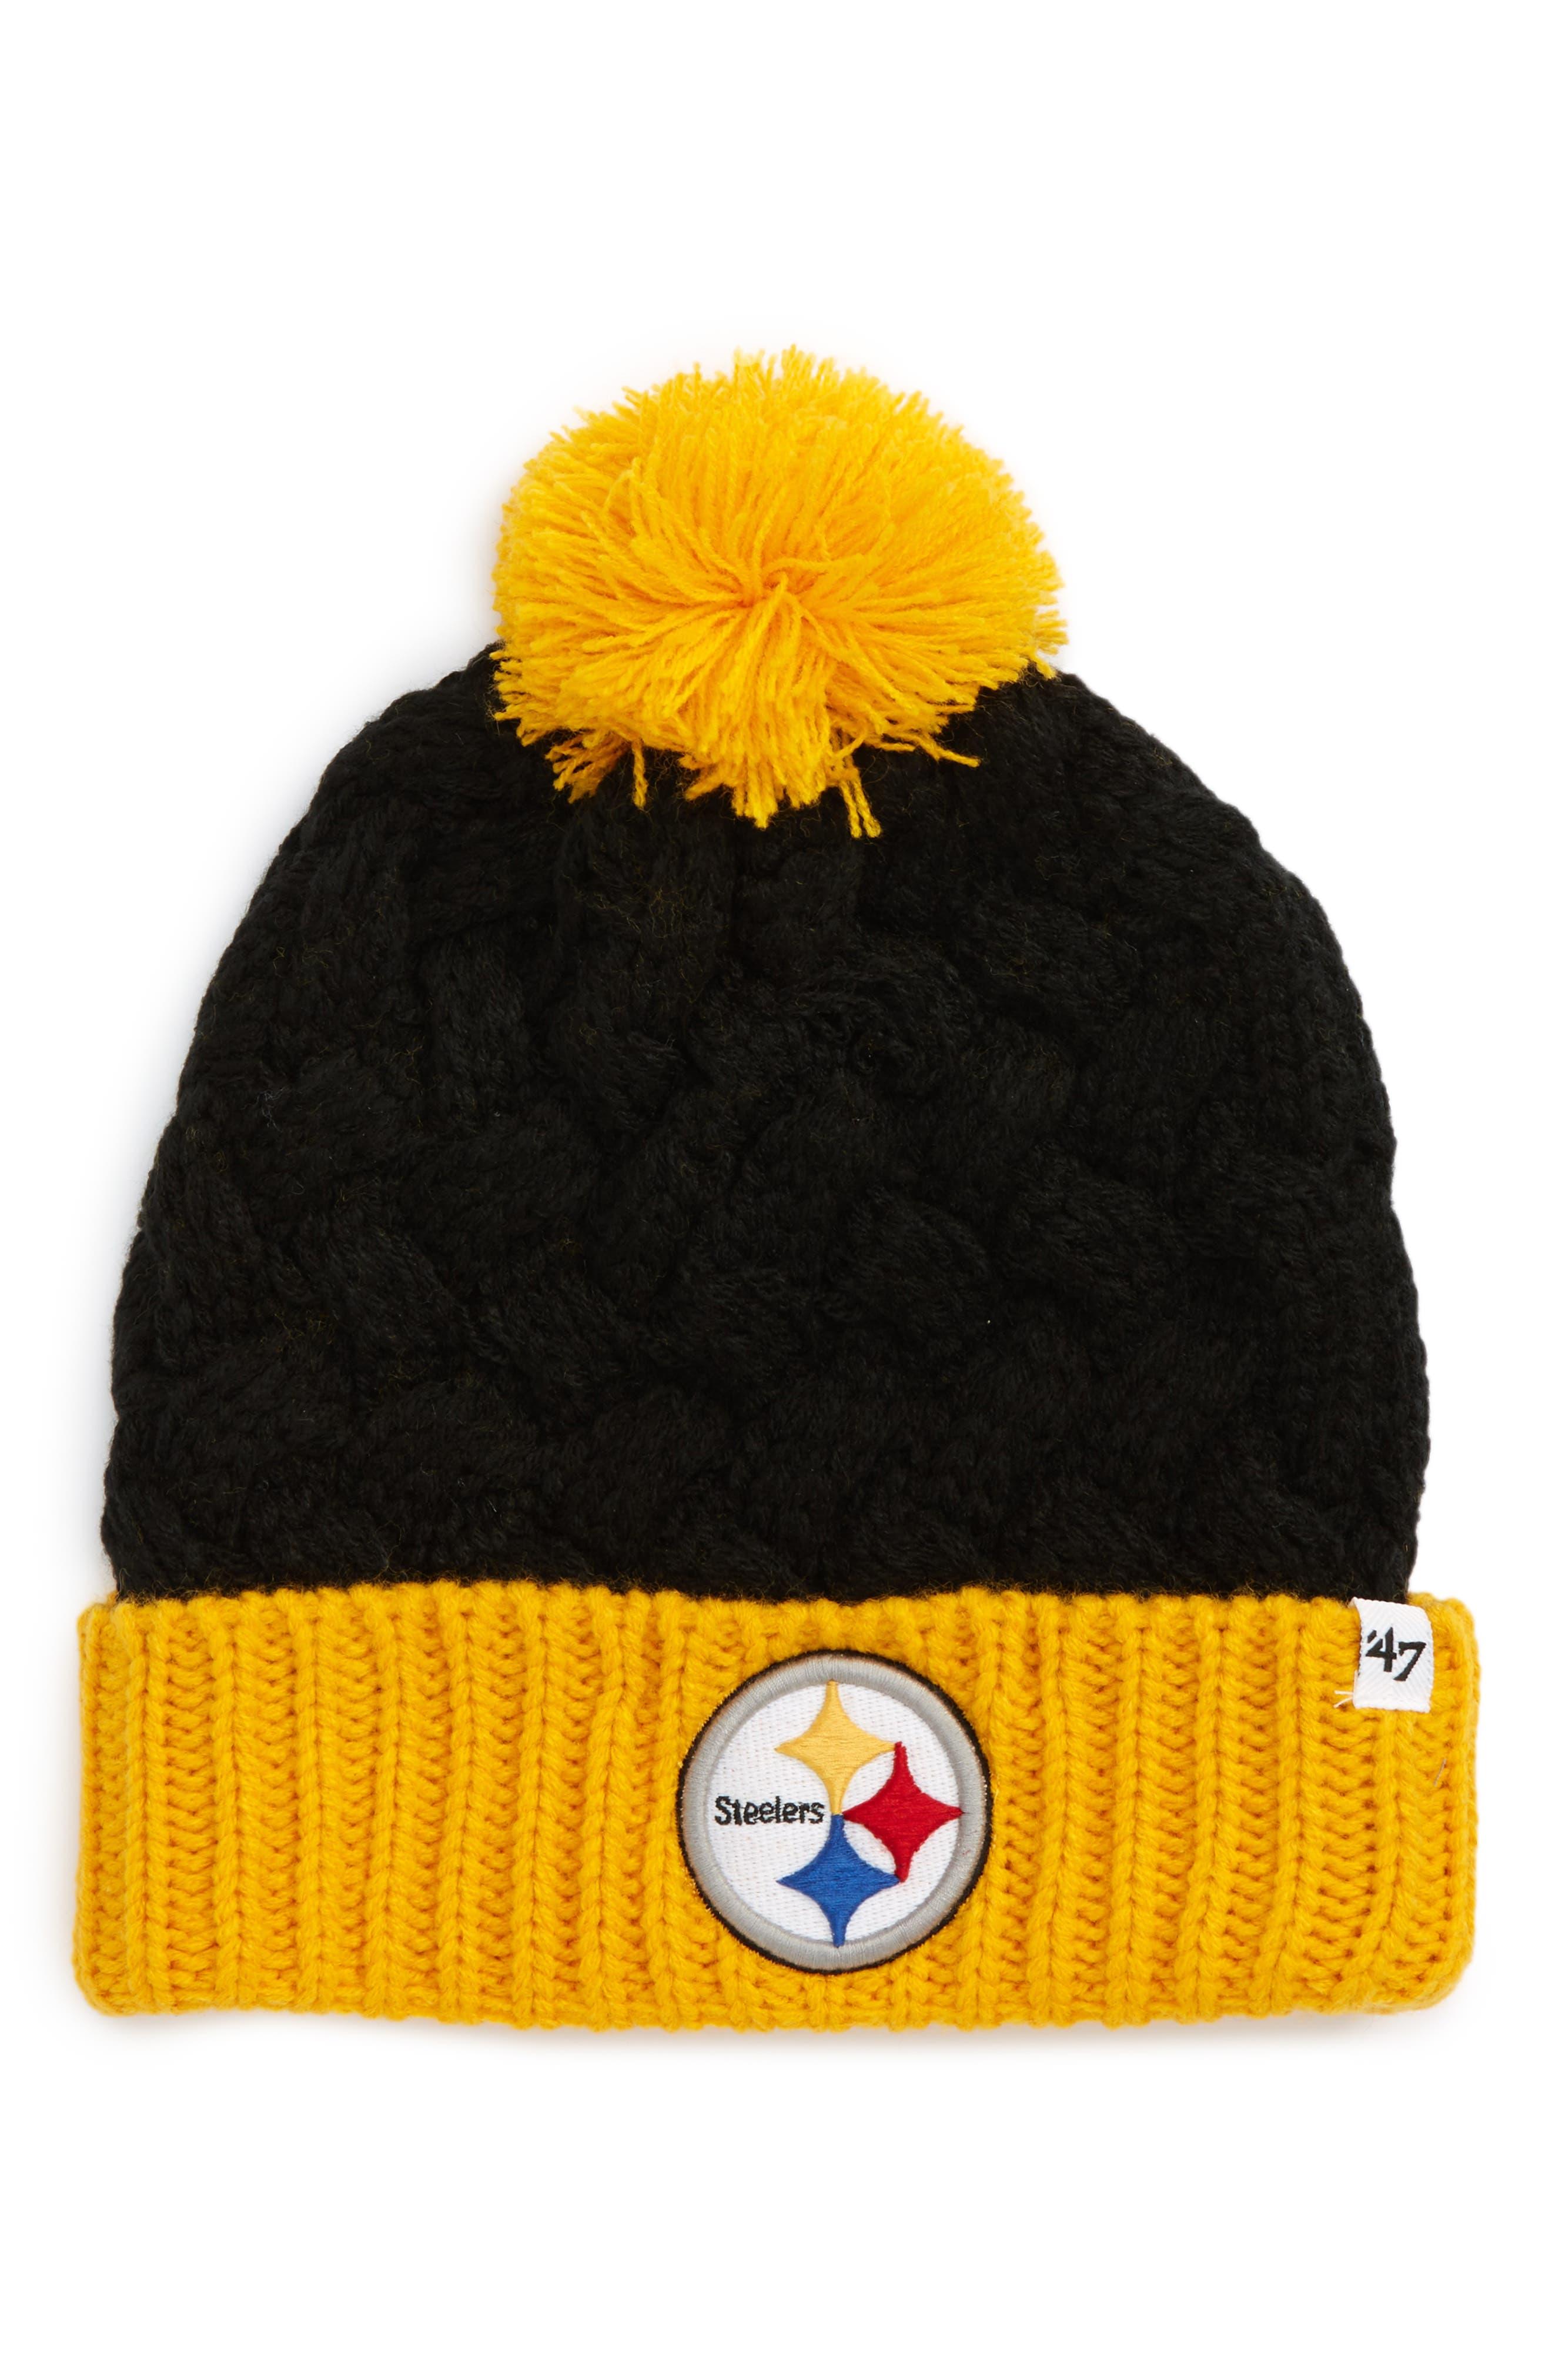 Matterhorn Pittsburgh Steelers Beanie,                         Main,                         color, Black